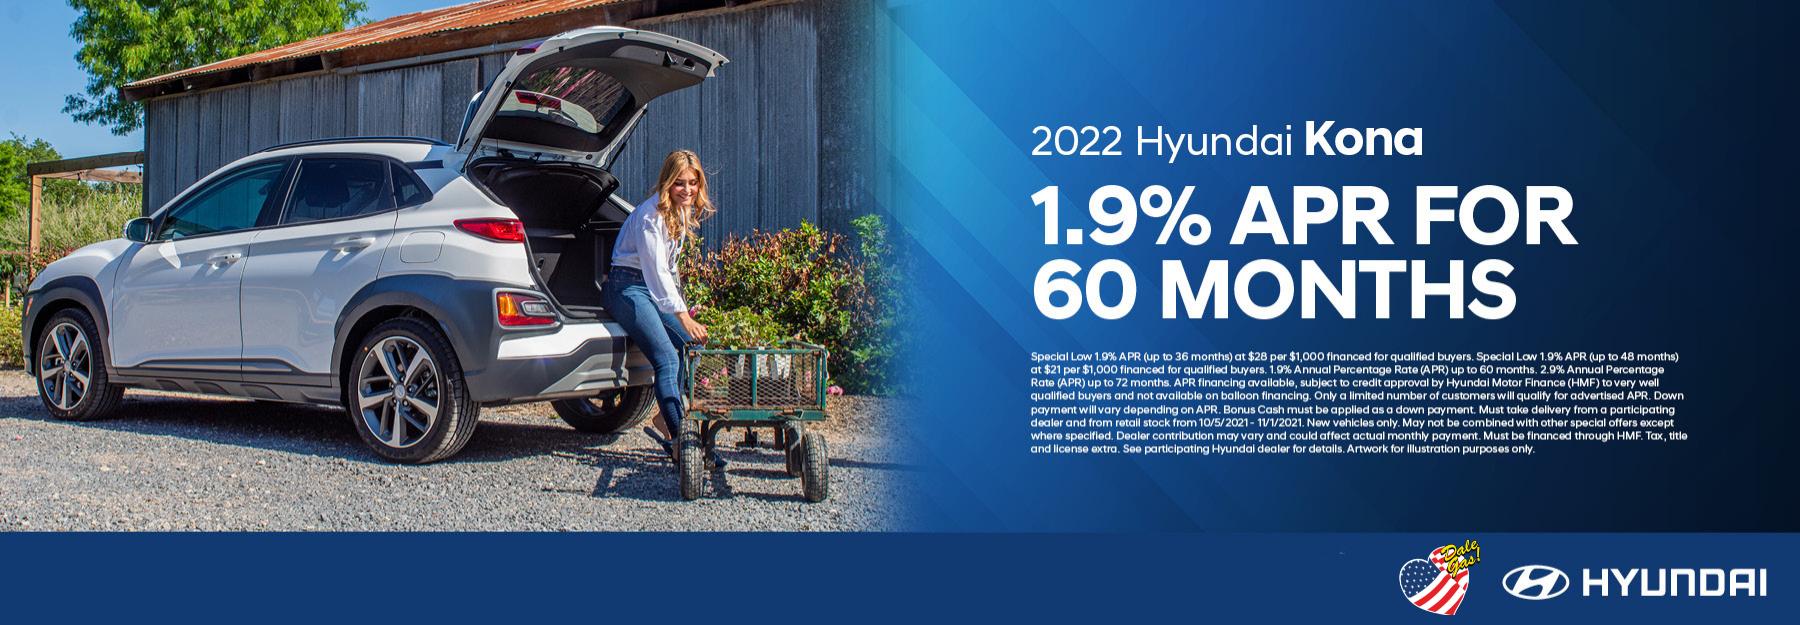 2022 Hyundai Kona Offer | Bert Ogden Hyundai in Harlingen, Texas